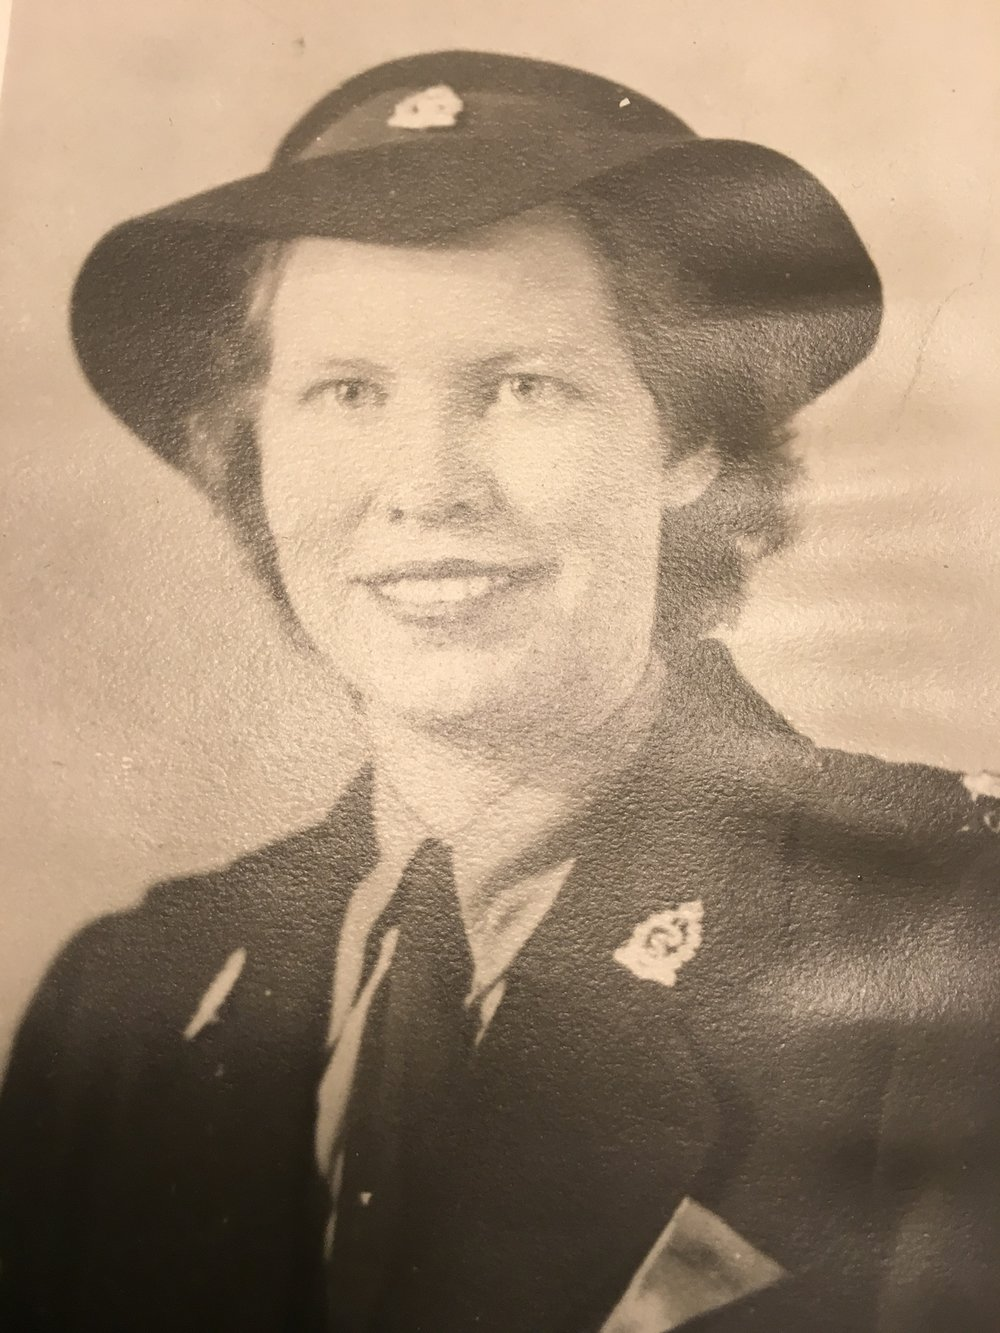 Nursing sister Ellenore Green Barker